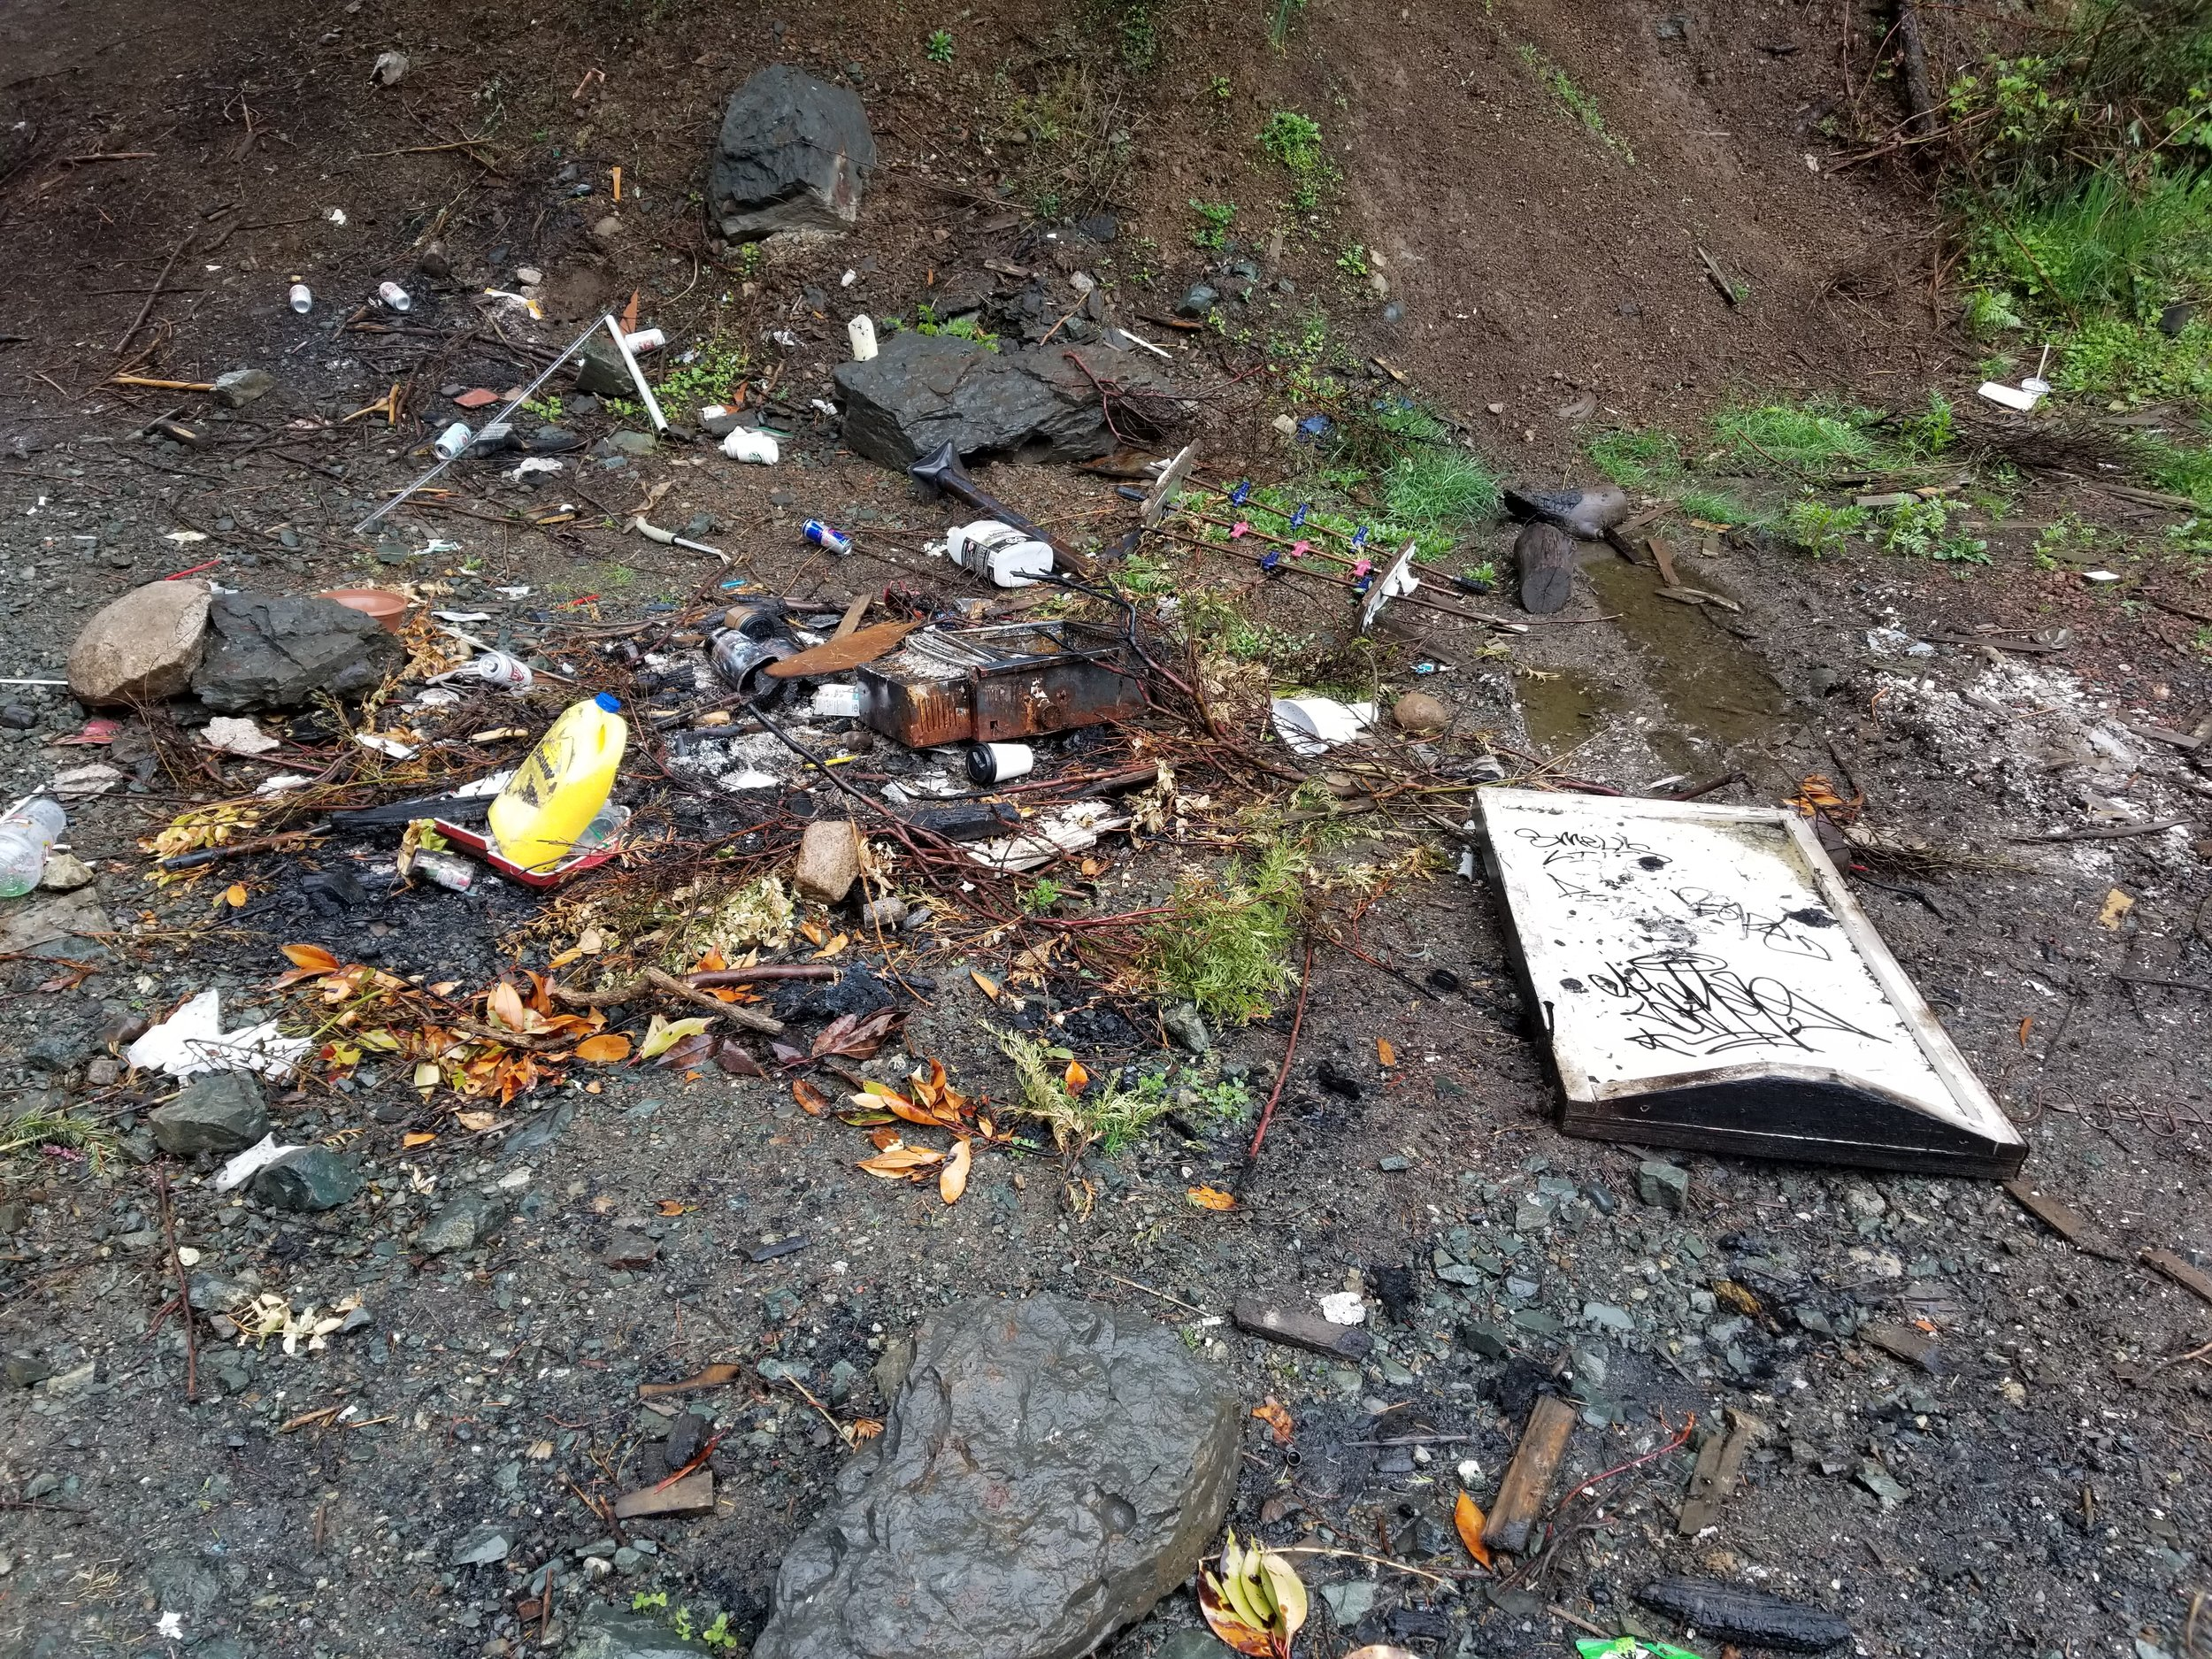 cowichan bay trash cleanup 1.jpg